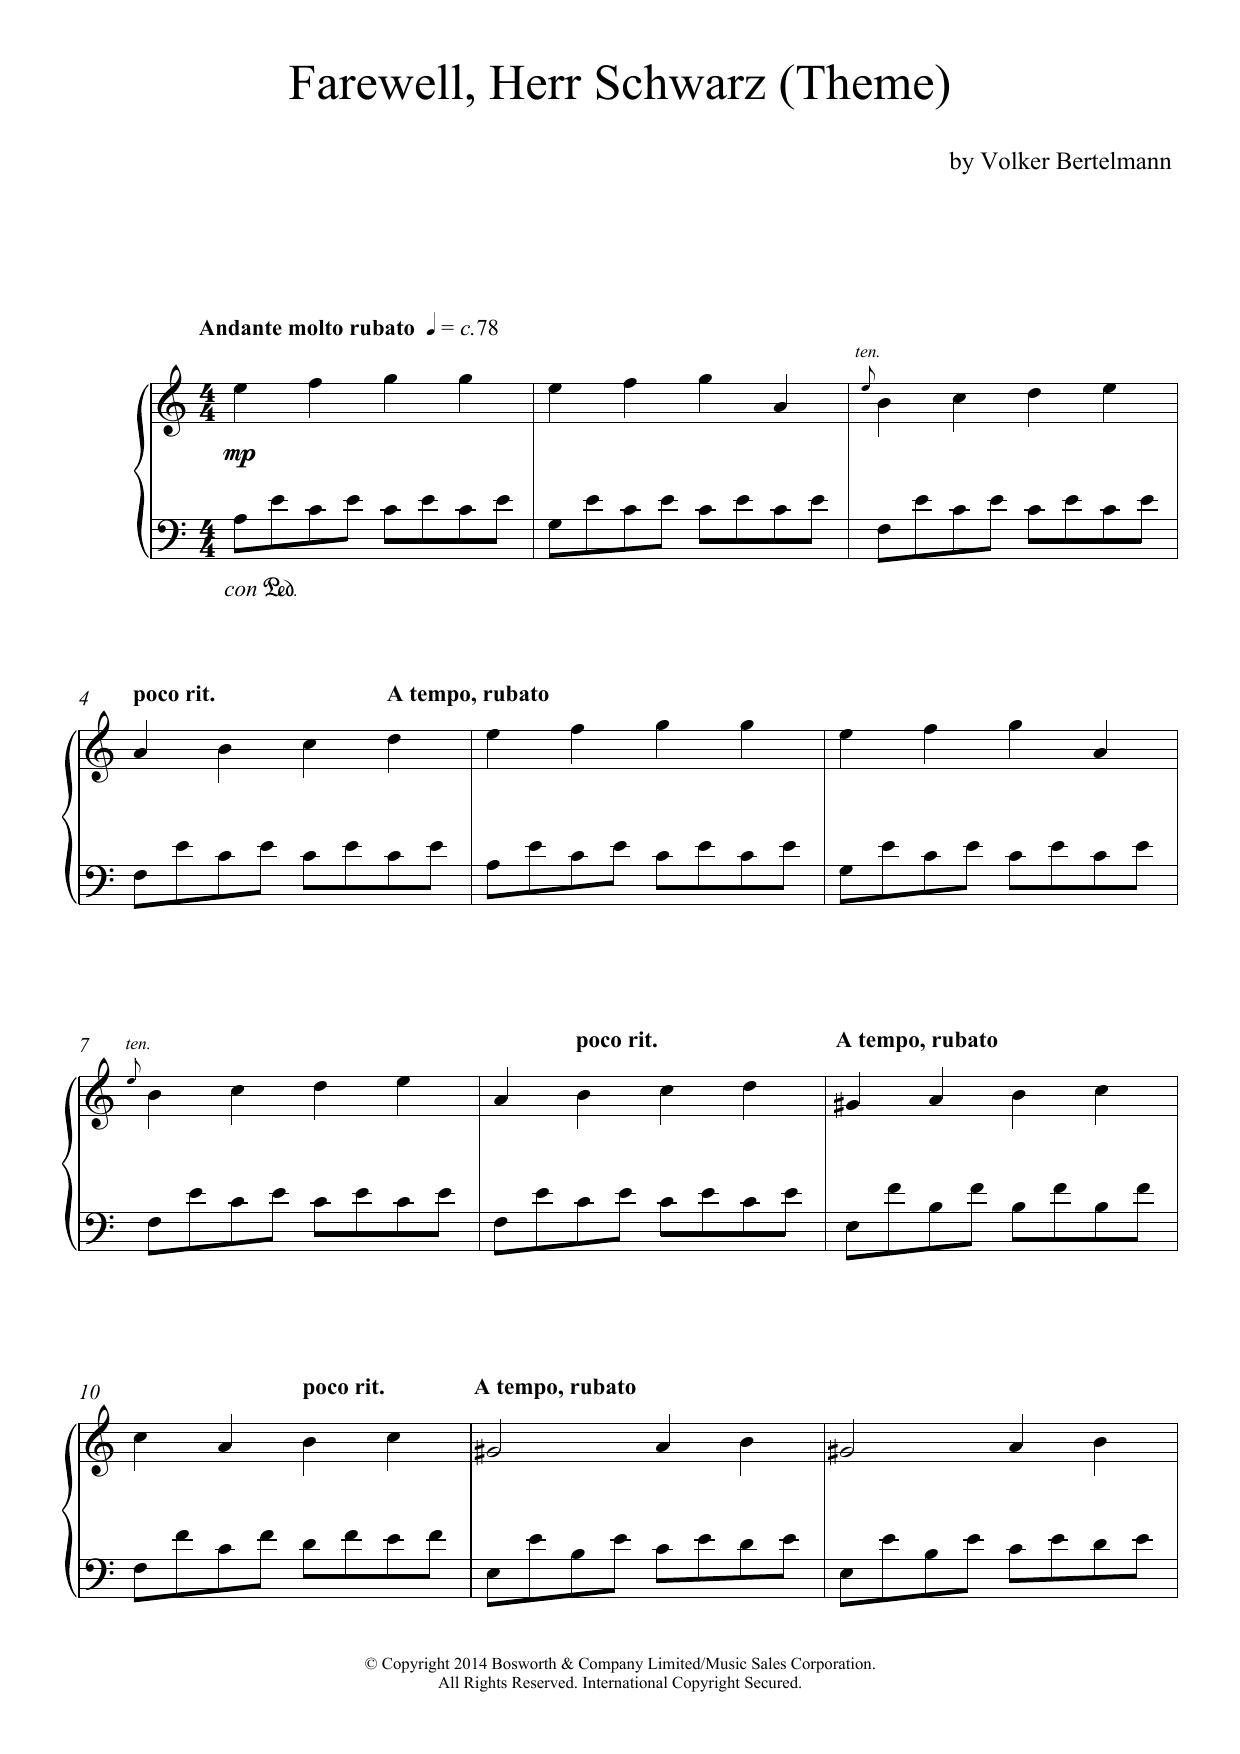 Hauschka - Farewell, Herr Schwarz (Theme)